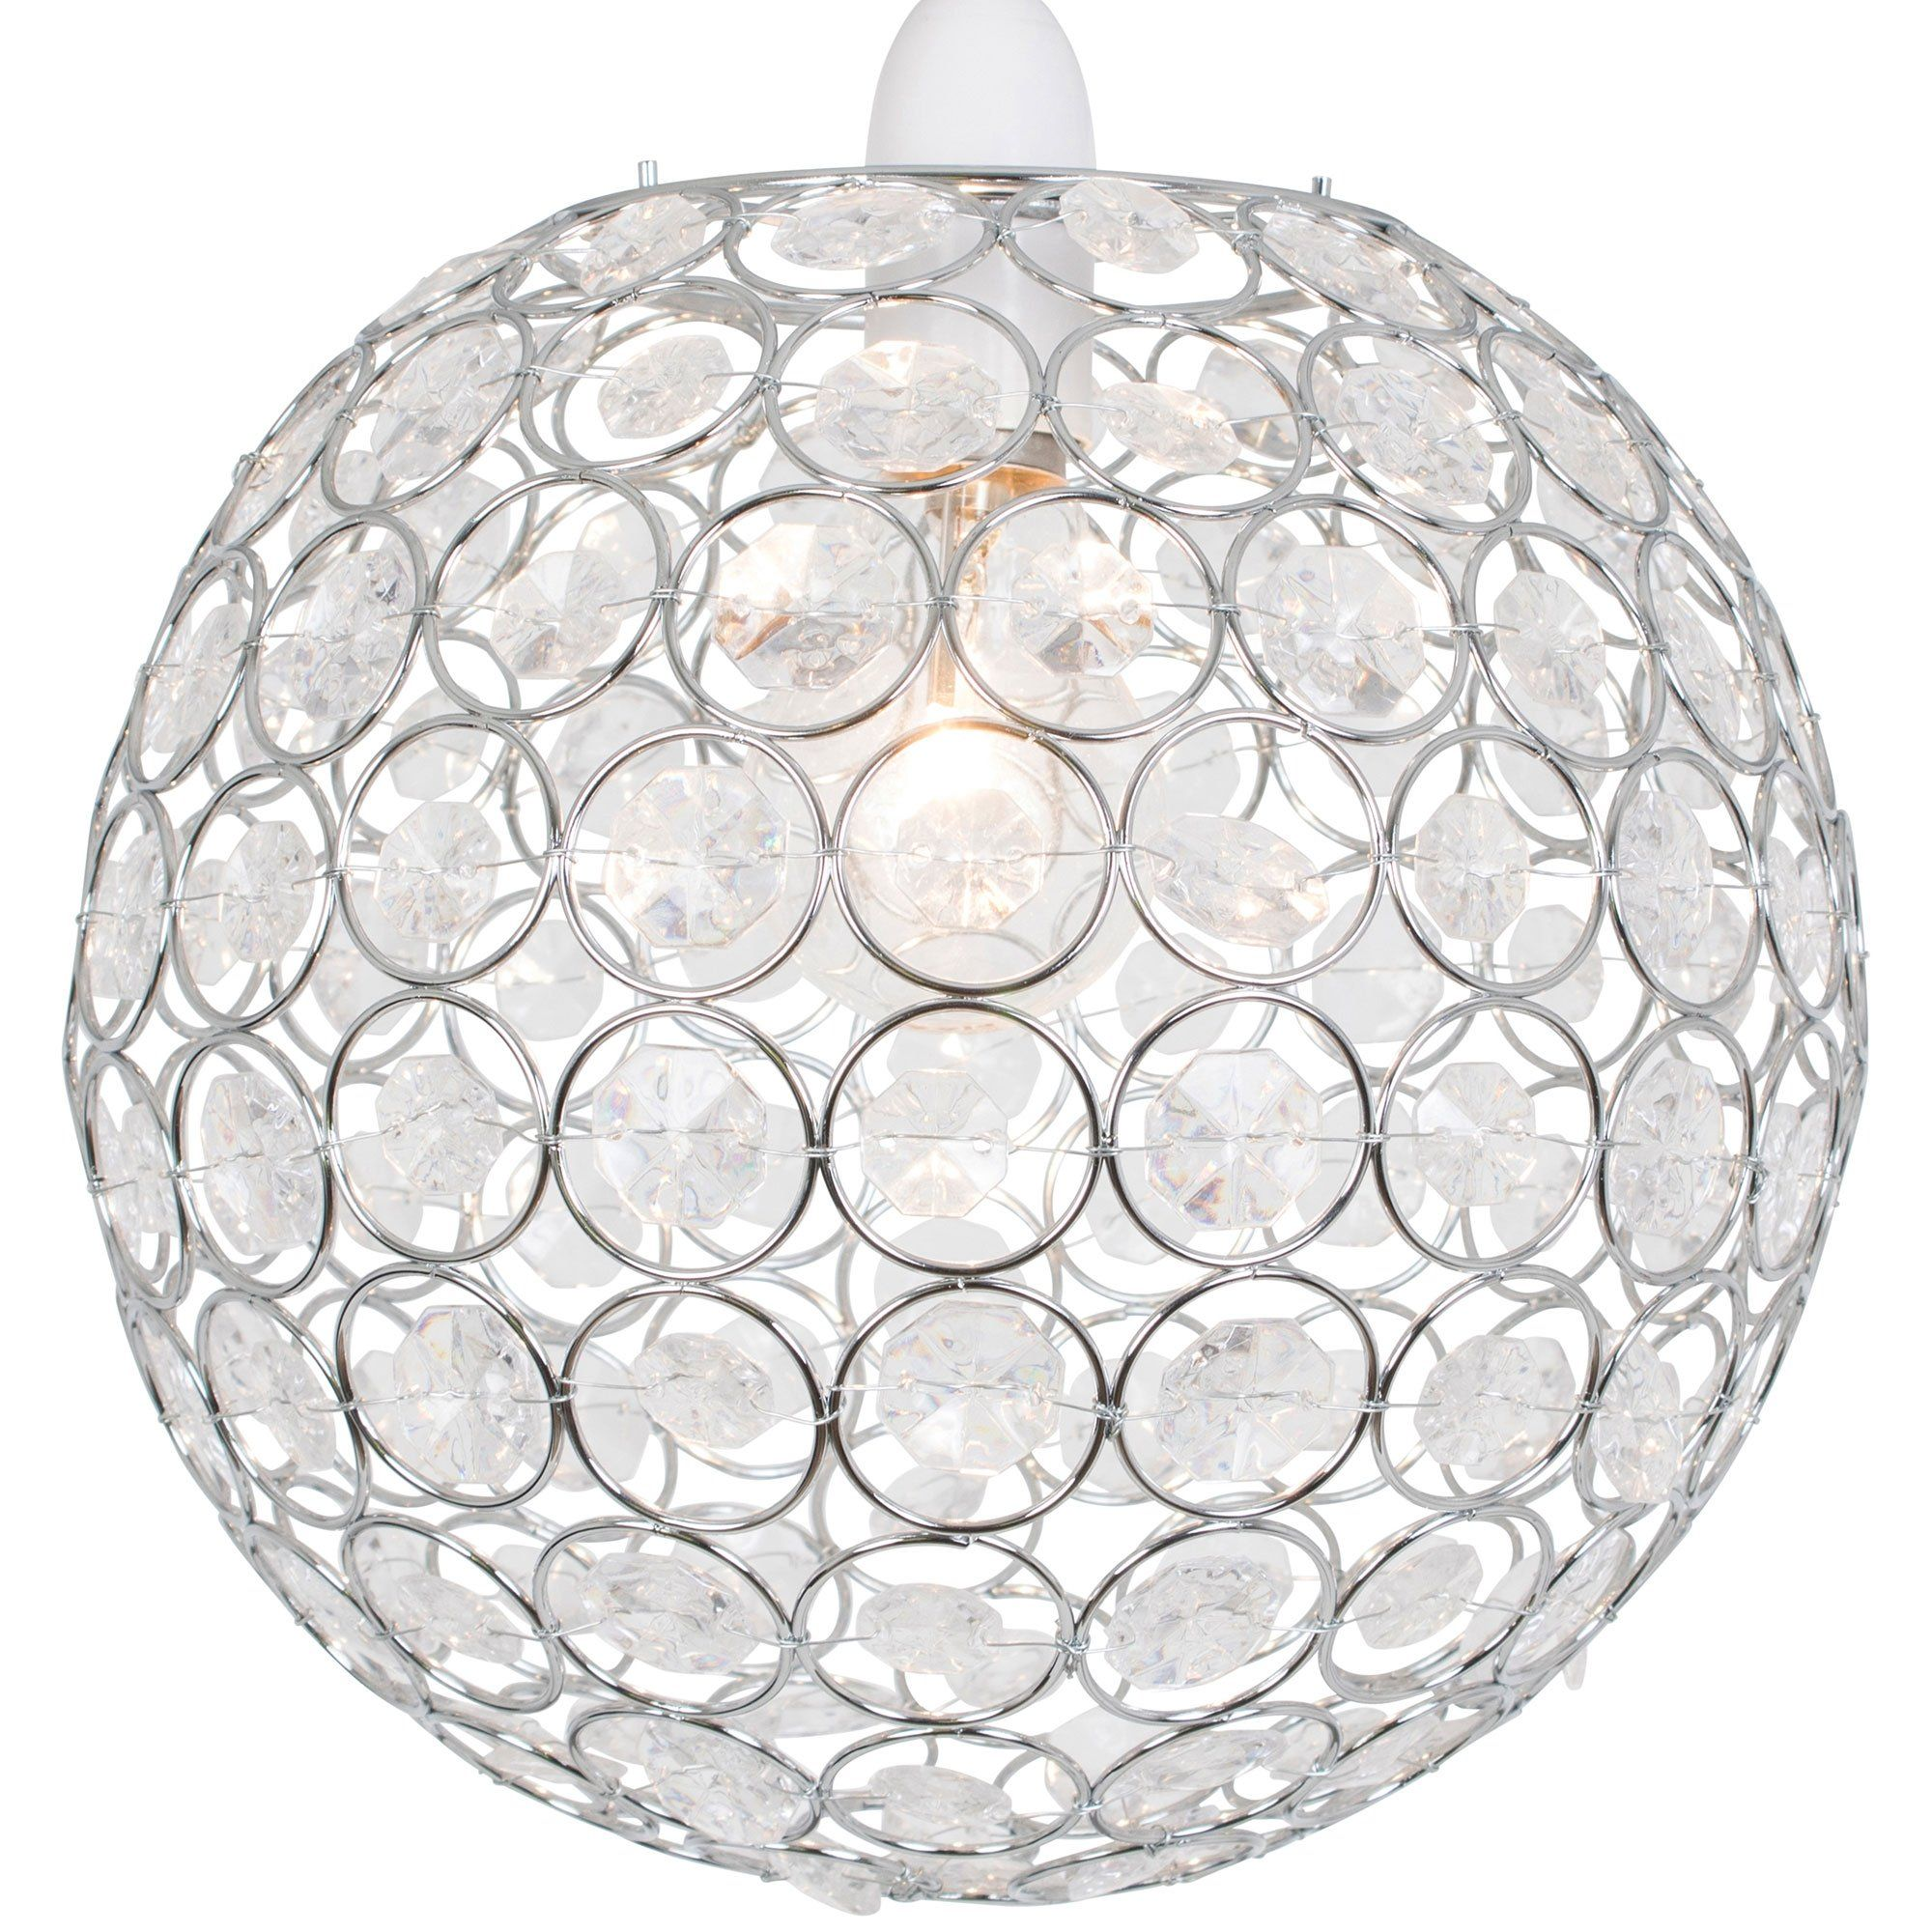 Ball 24cm Pendant Ceiling Shade